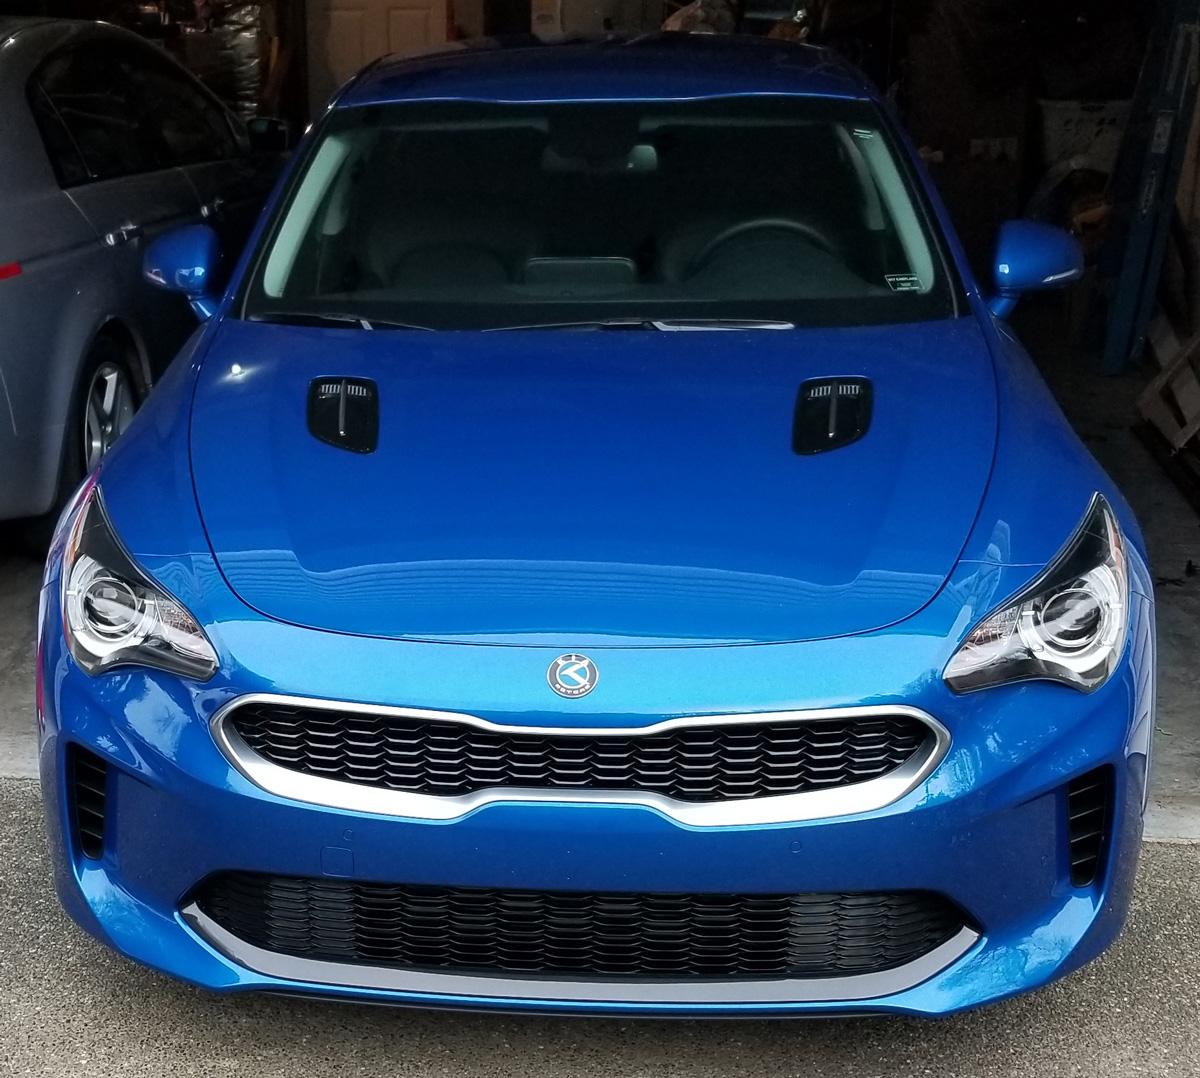 OEM Kia Motors Badge - Kia Stinger dot com